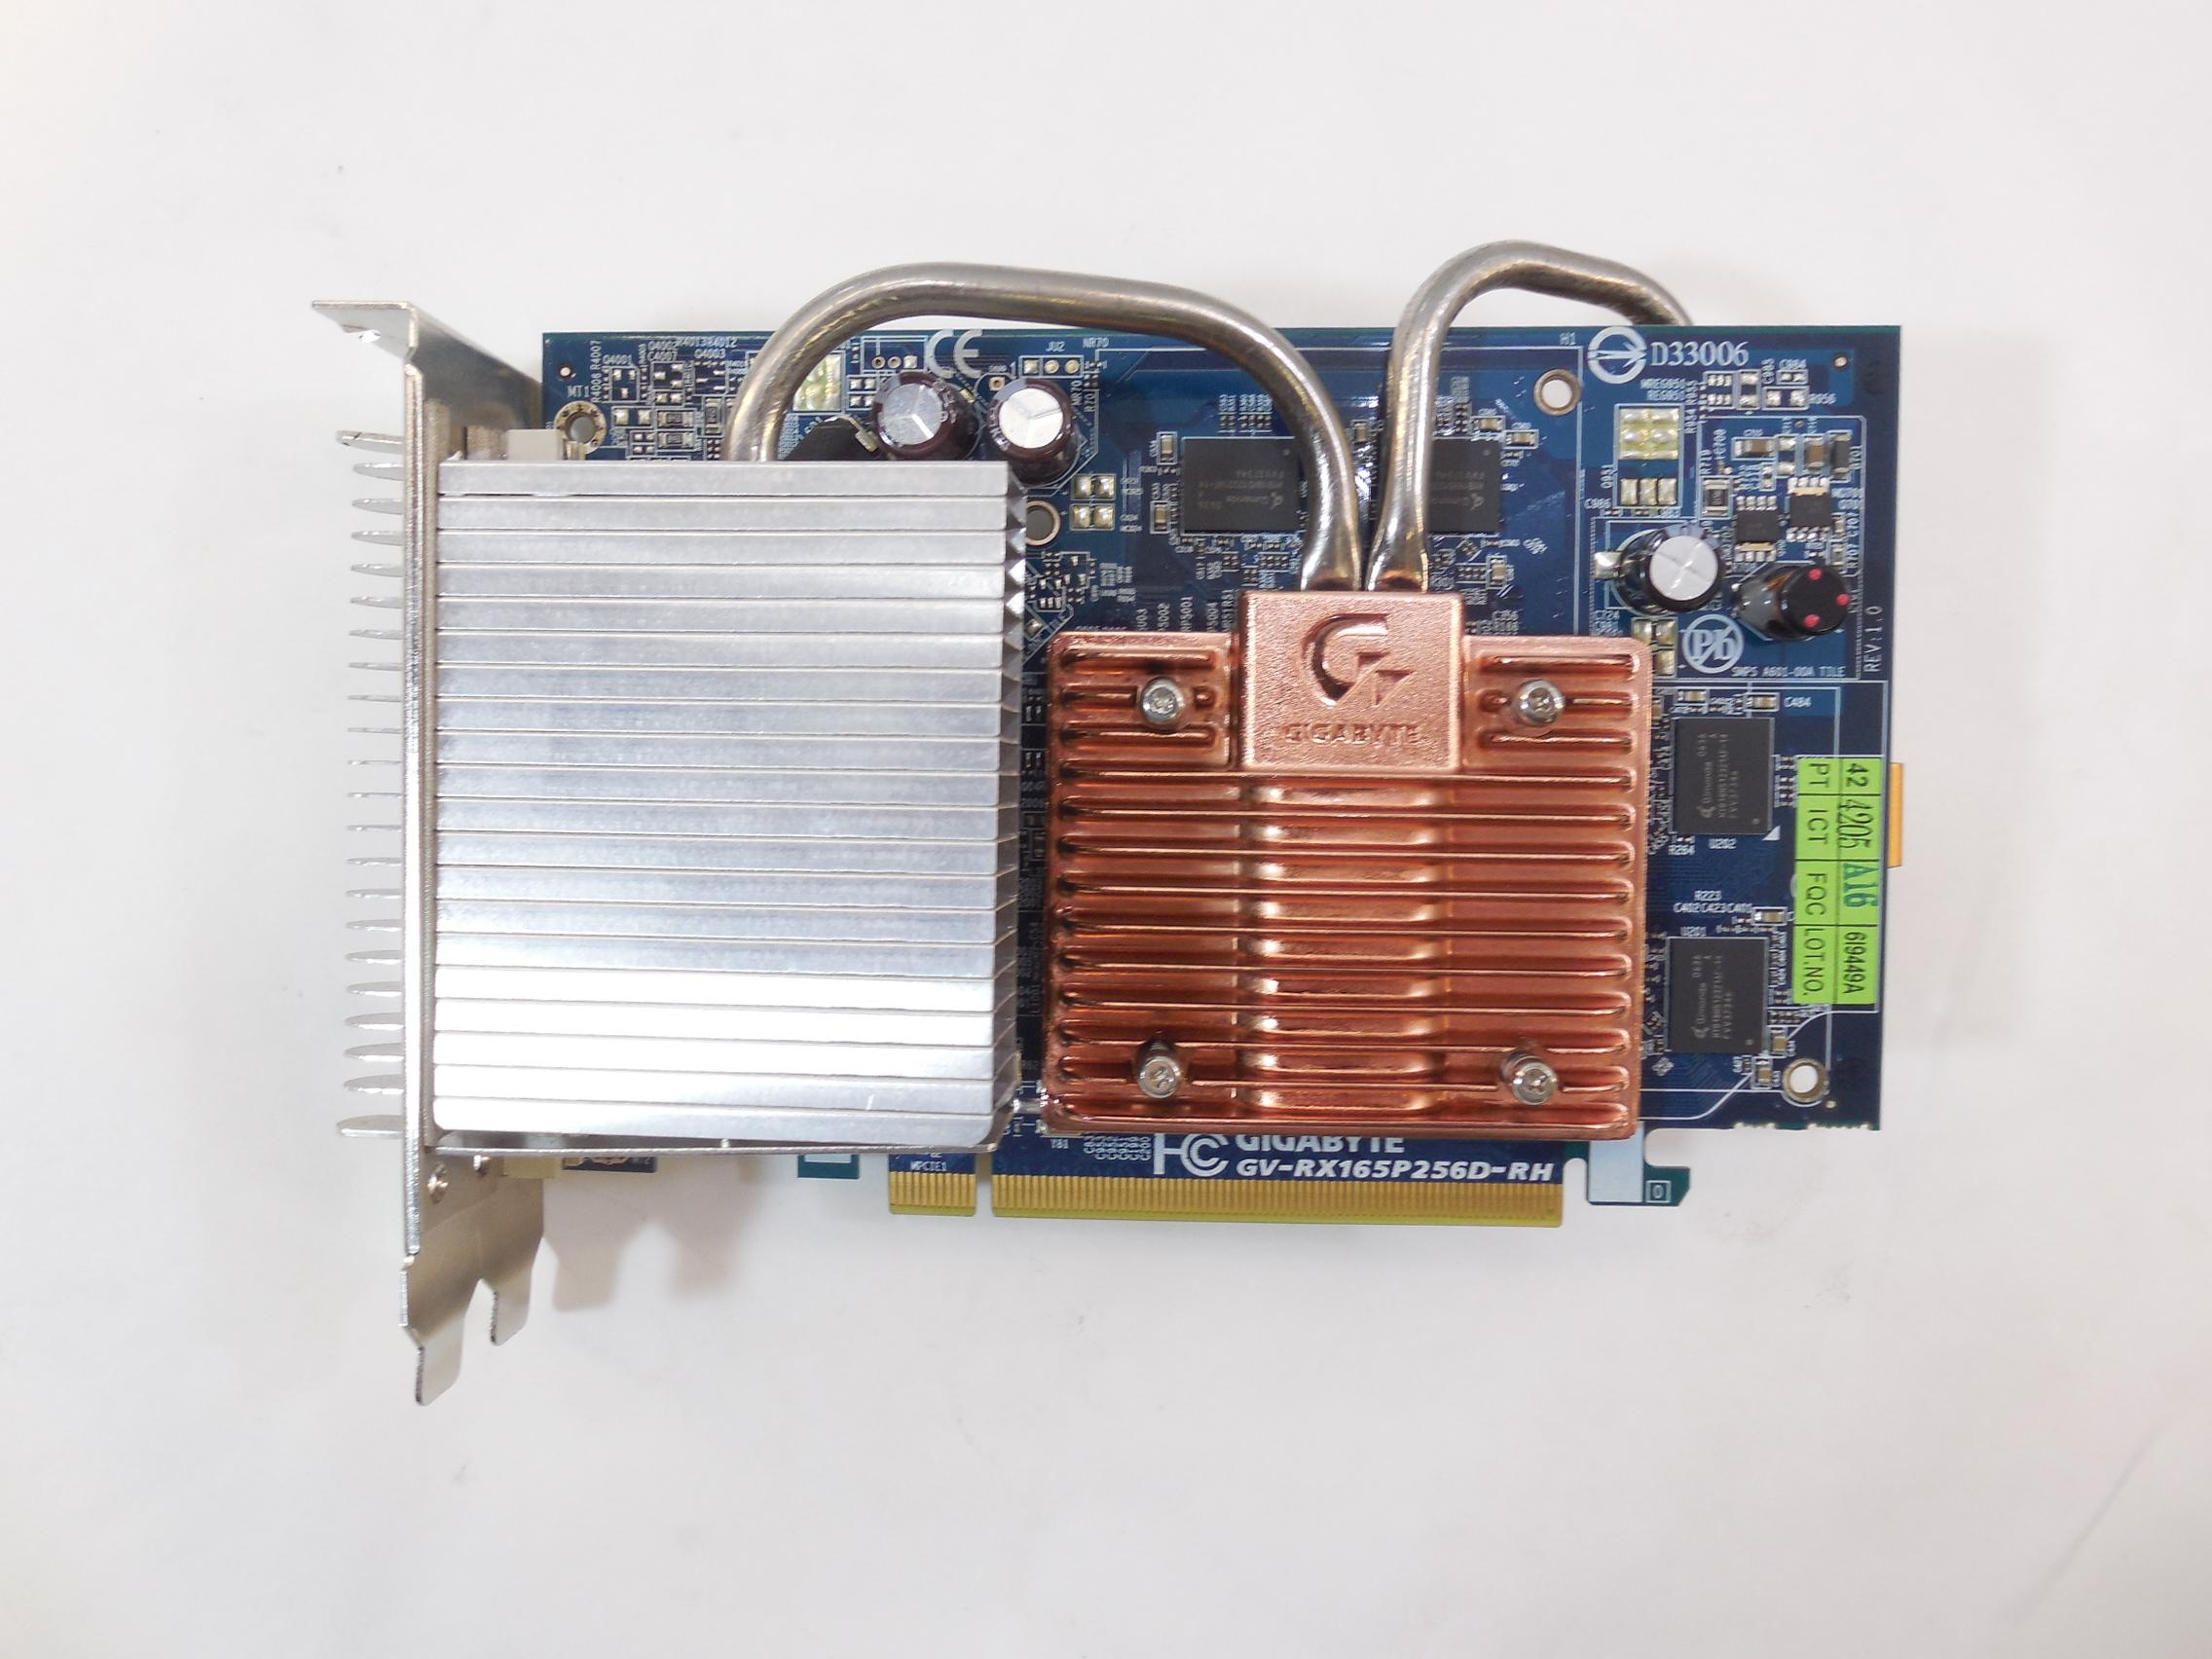 Видеокарта GIGABYTE Radeon X1650 Pro 256Mb Silent